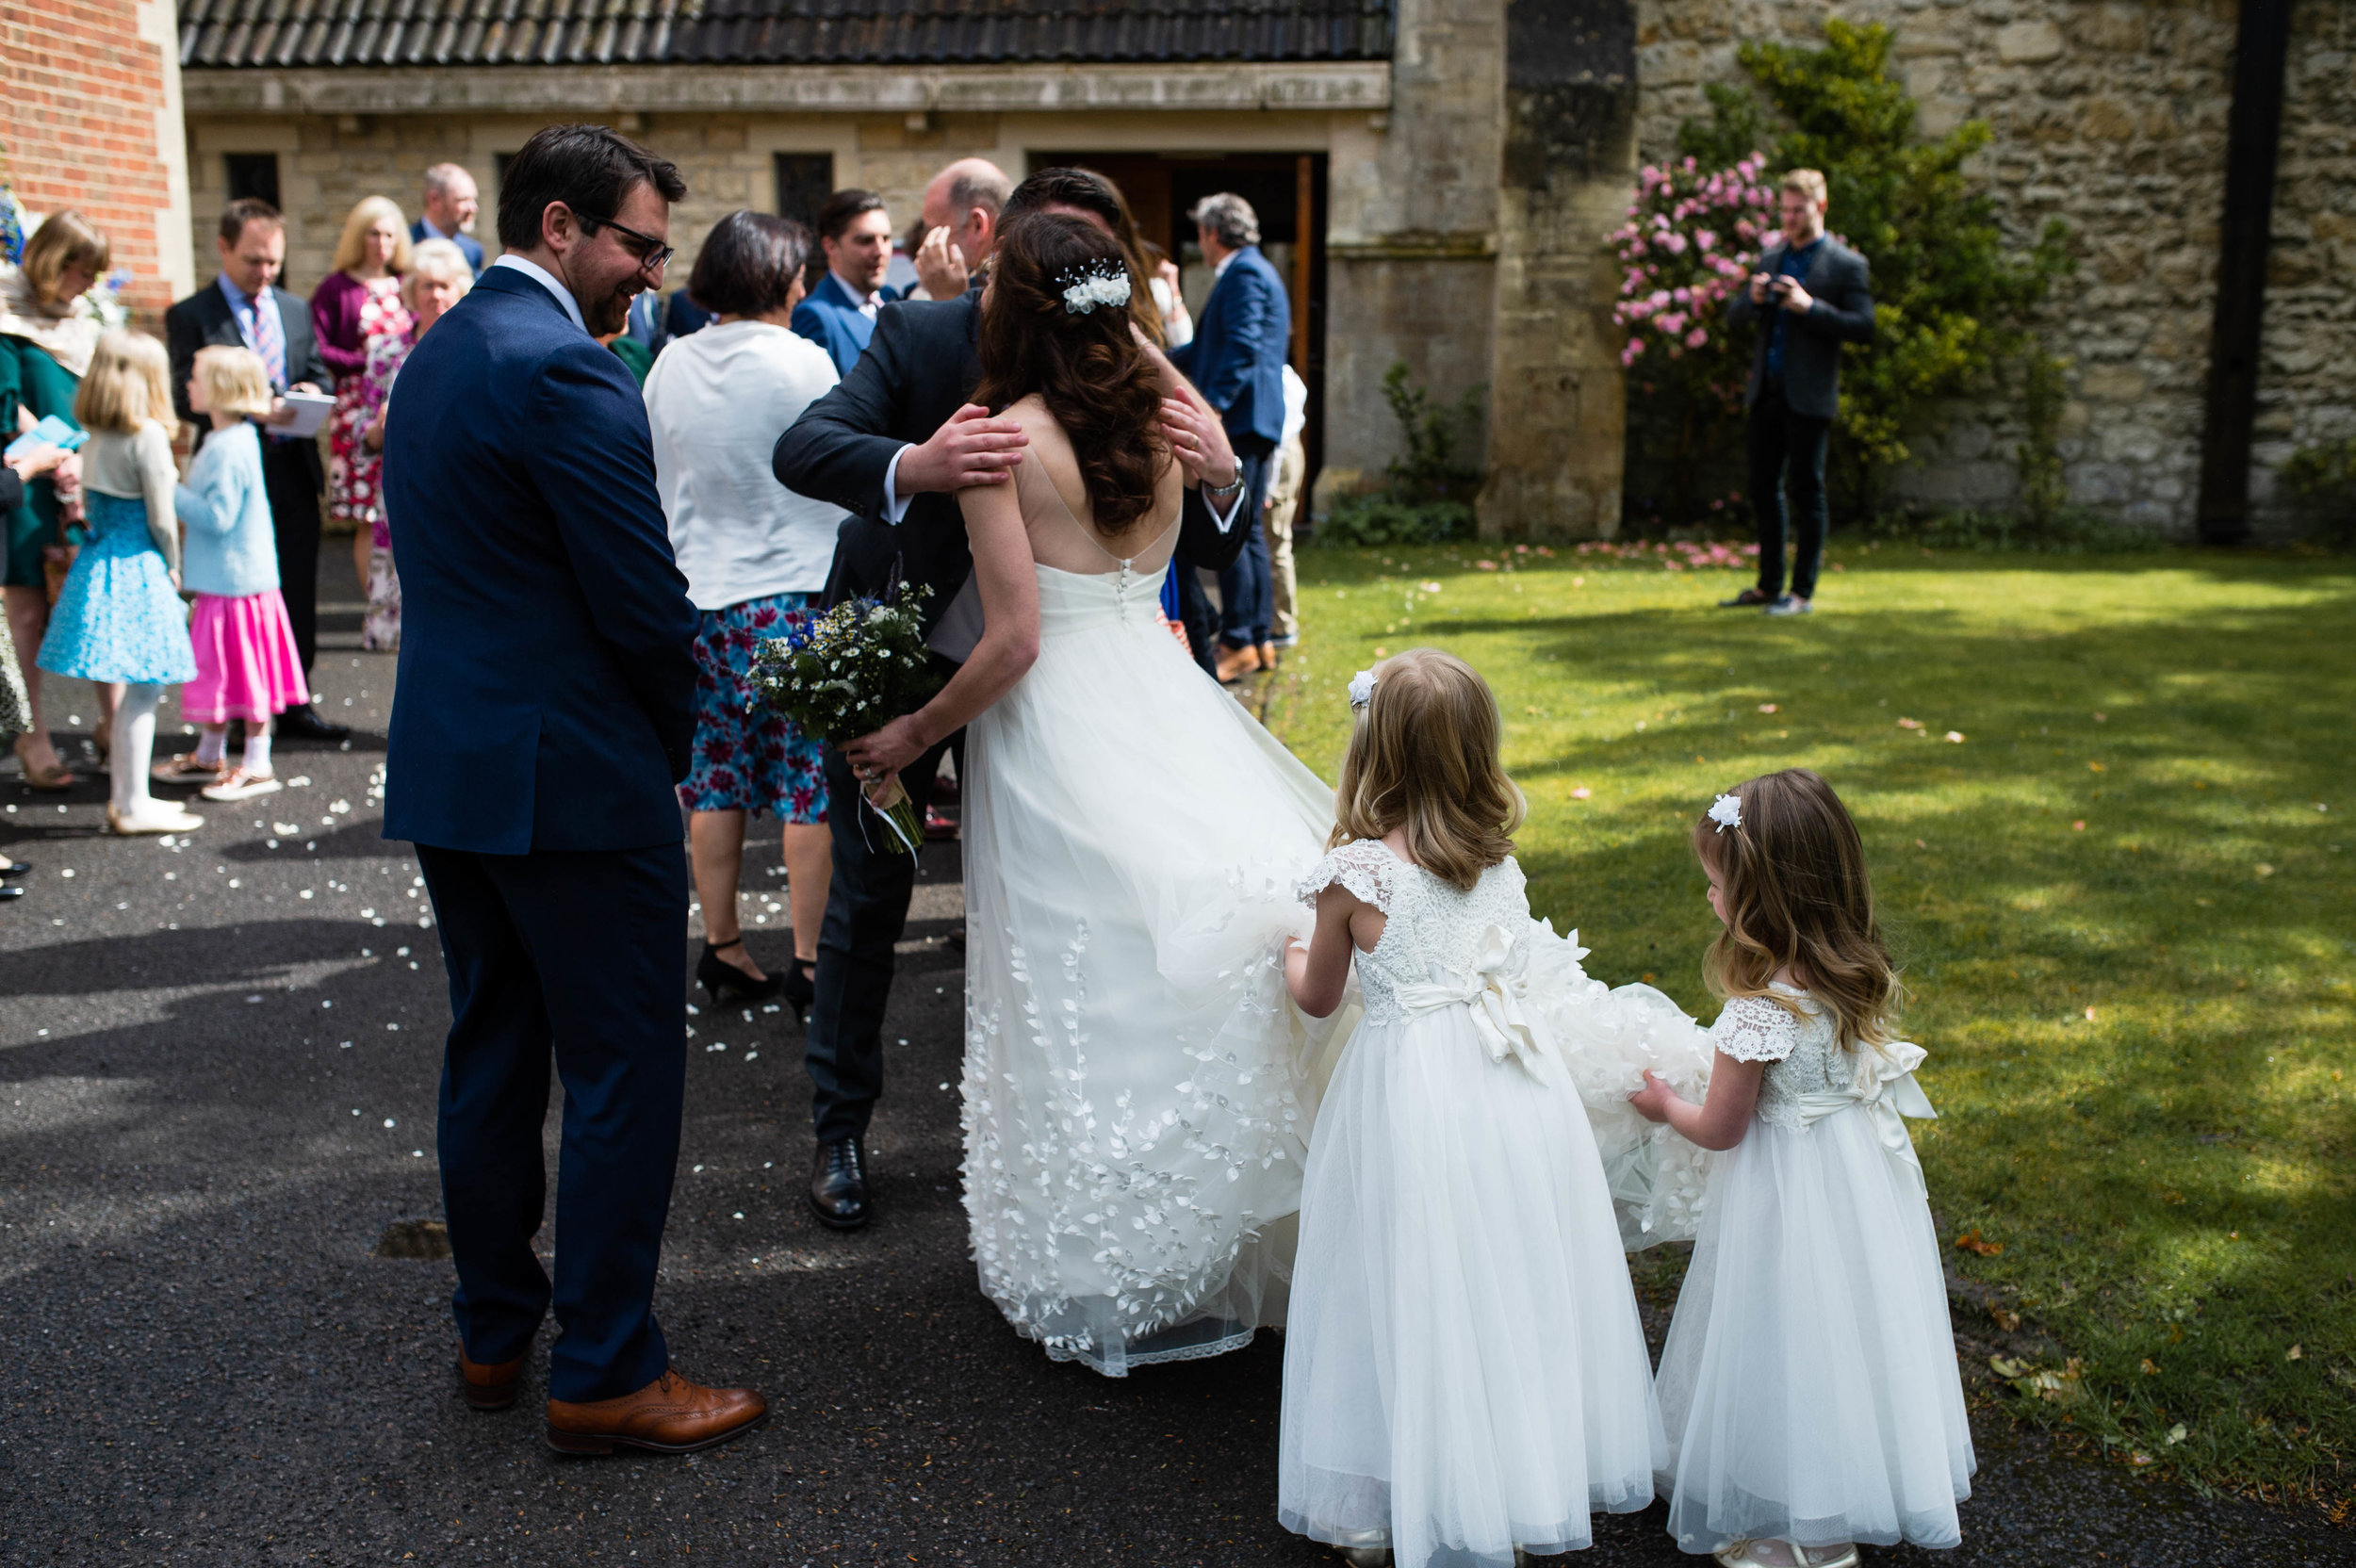 Beechfield house weddings - Abby and Greg (84 of 208).jpg